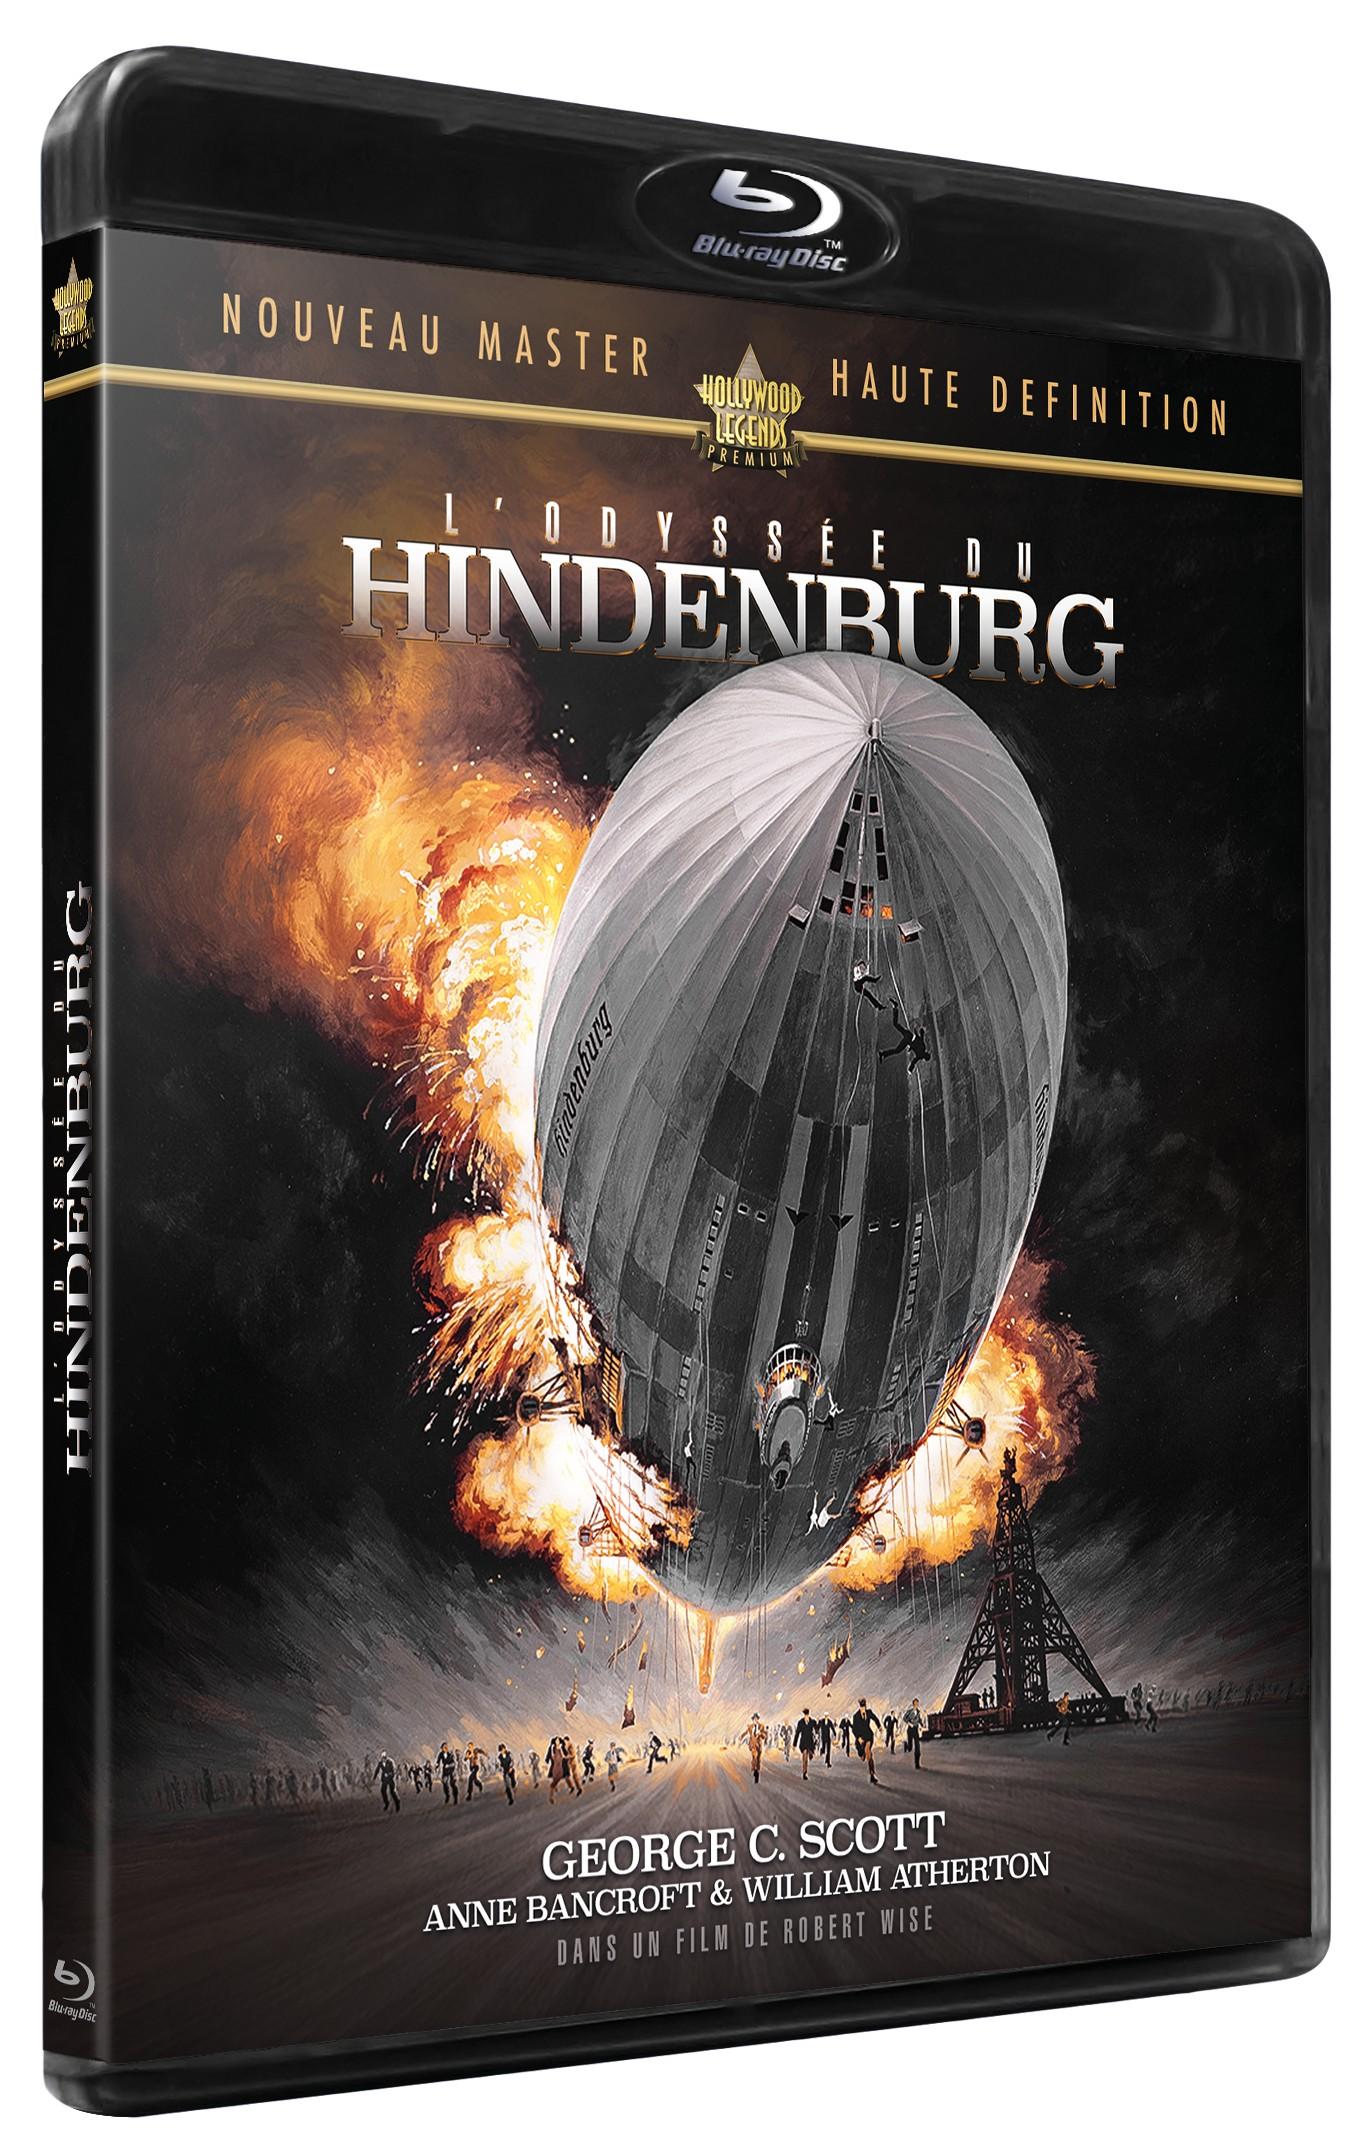 L'ODYSSEE DU HINDERBURG - BRD